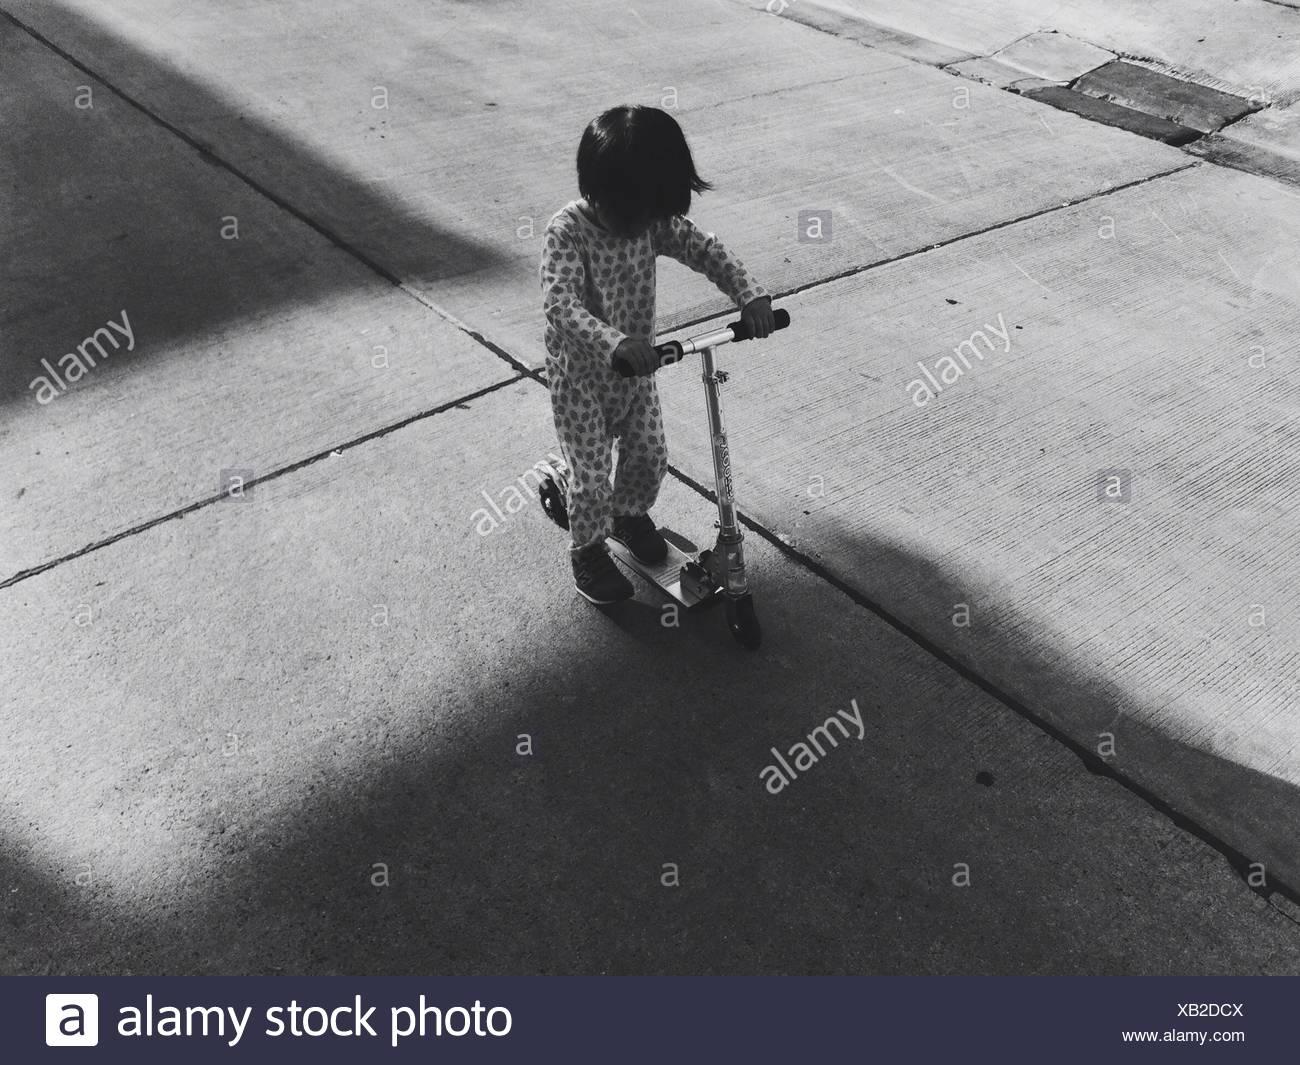 Un alto ángulo de visualización de Boy Caballo empuje Scooter Foto de stock